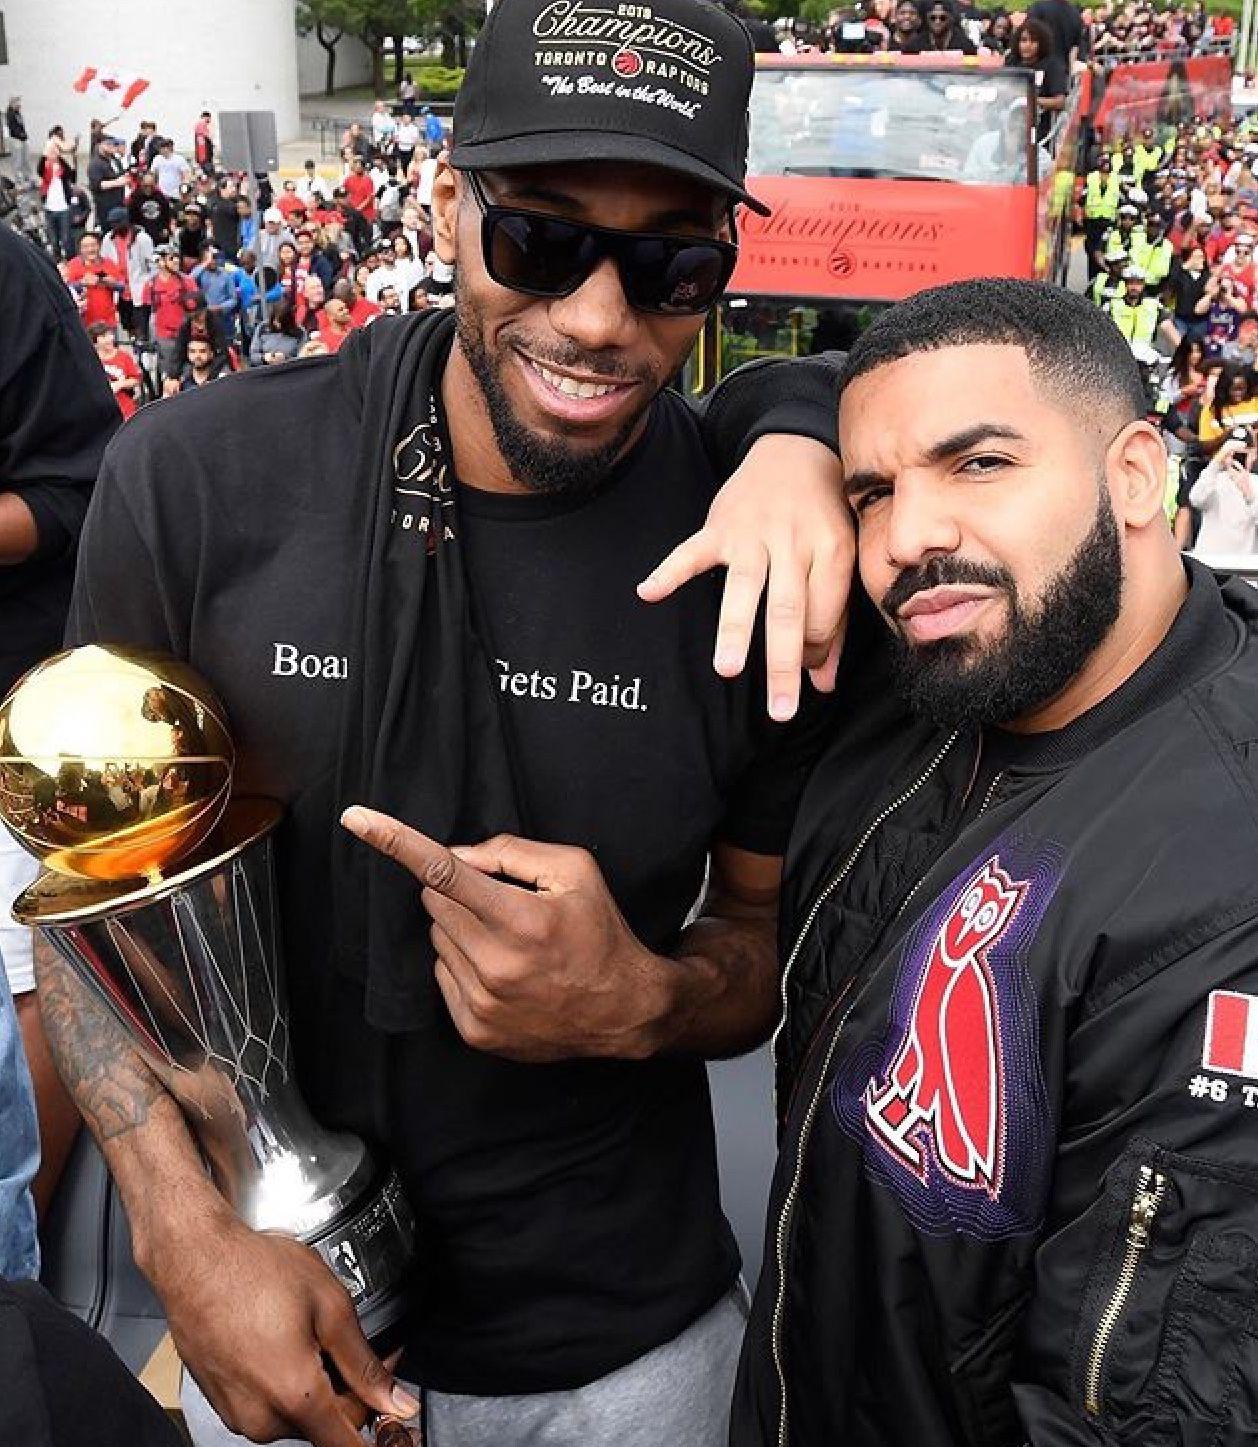 Board Man Gets Paid 🏆🇨🇦 Drake, Raptors, Toronto